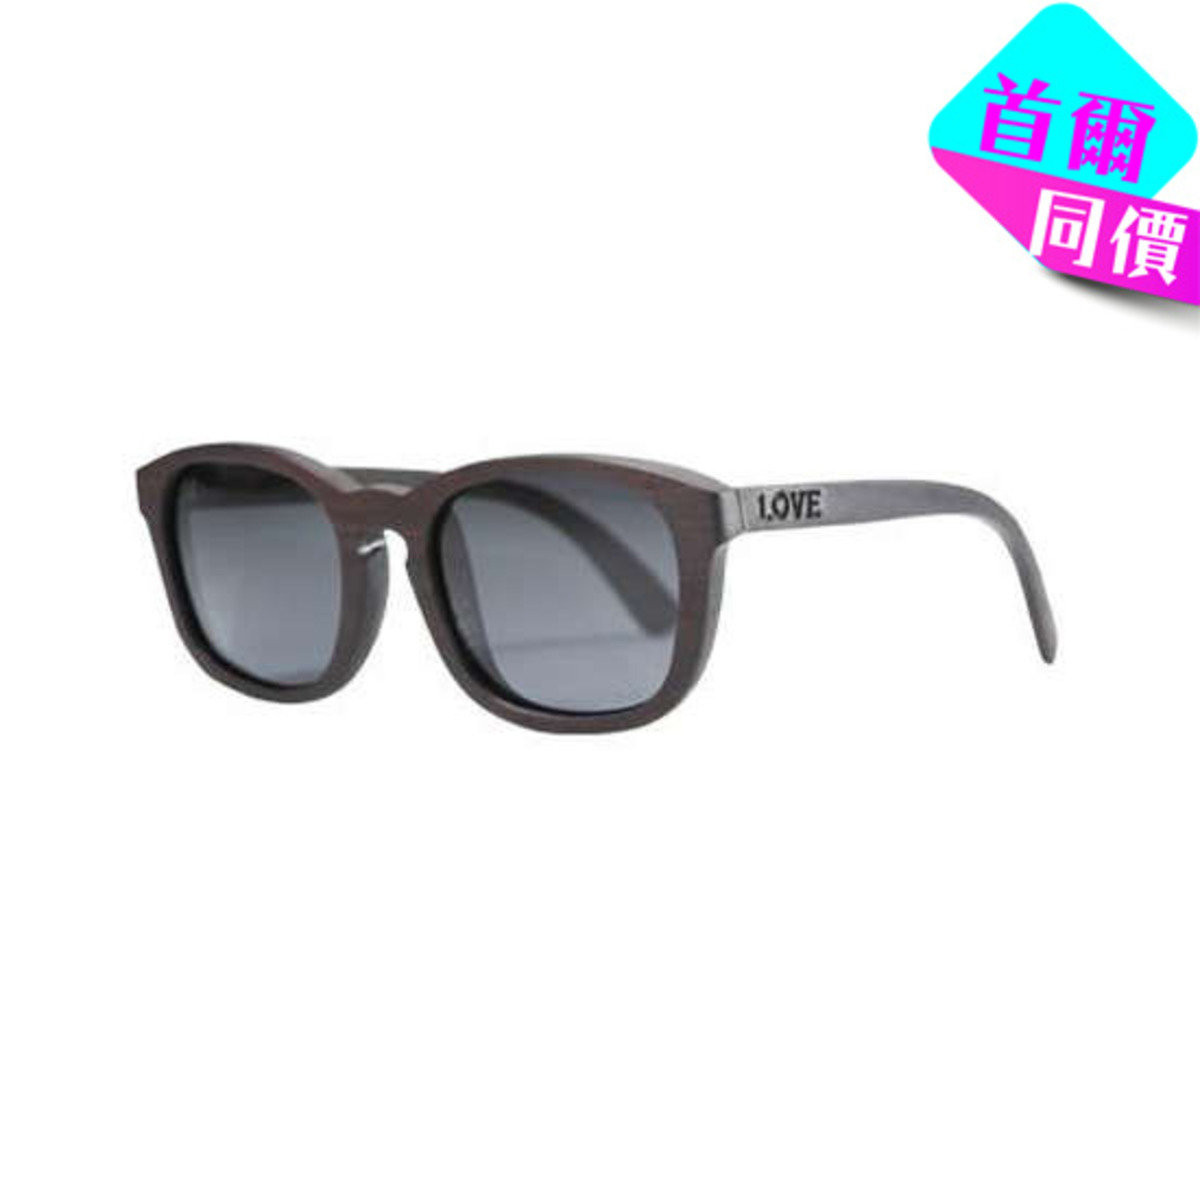 EBONY - 深啡啞色烏木框架太陽眼鏡